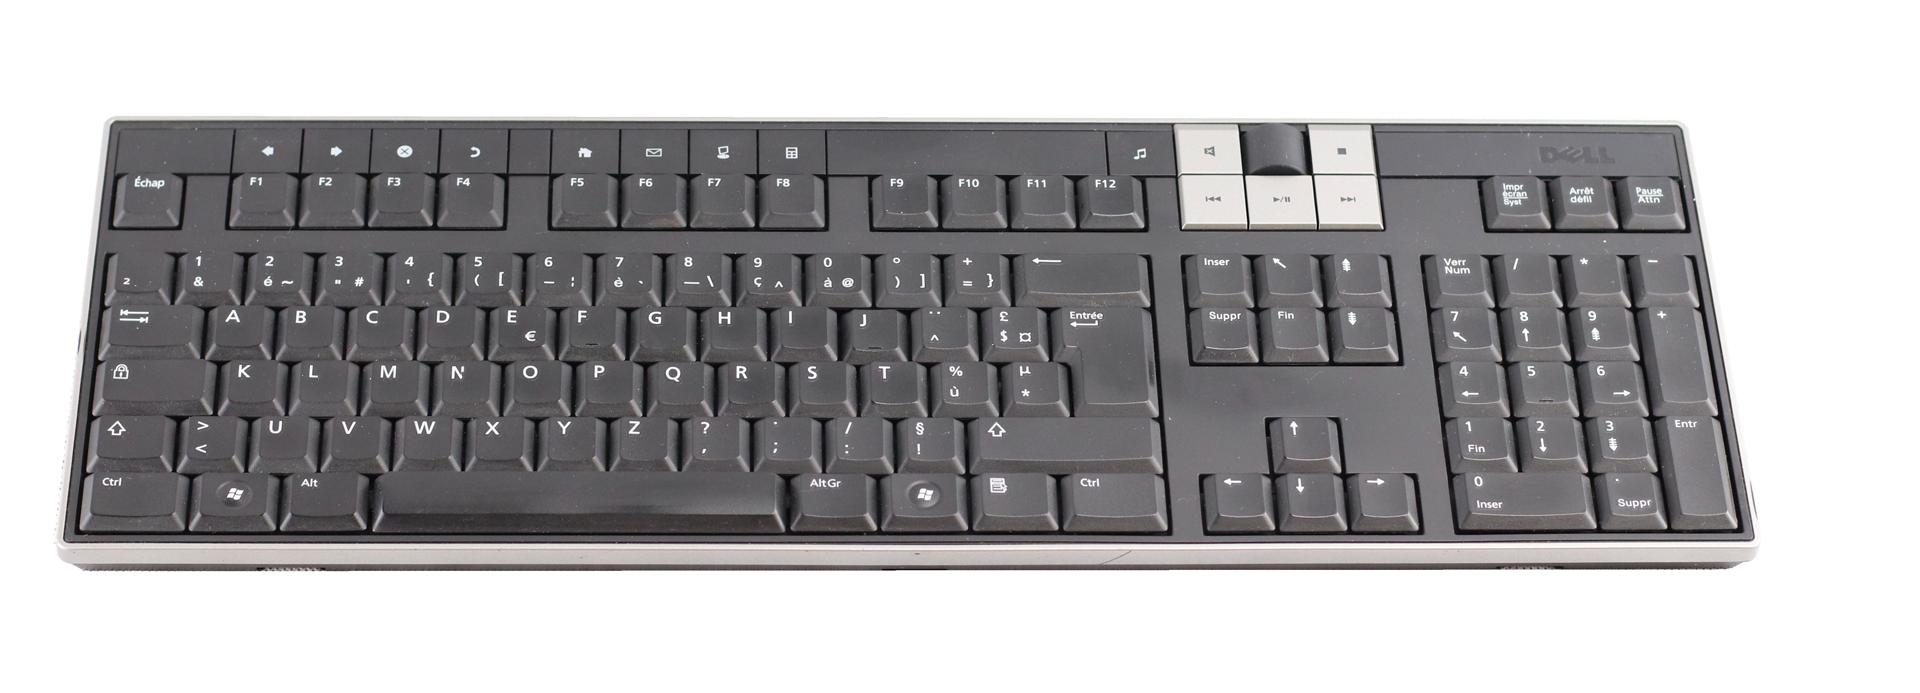 Trade clavier